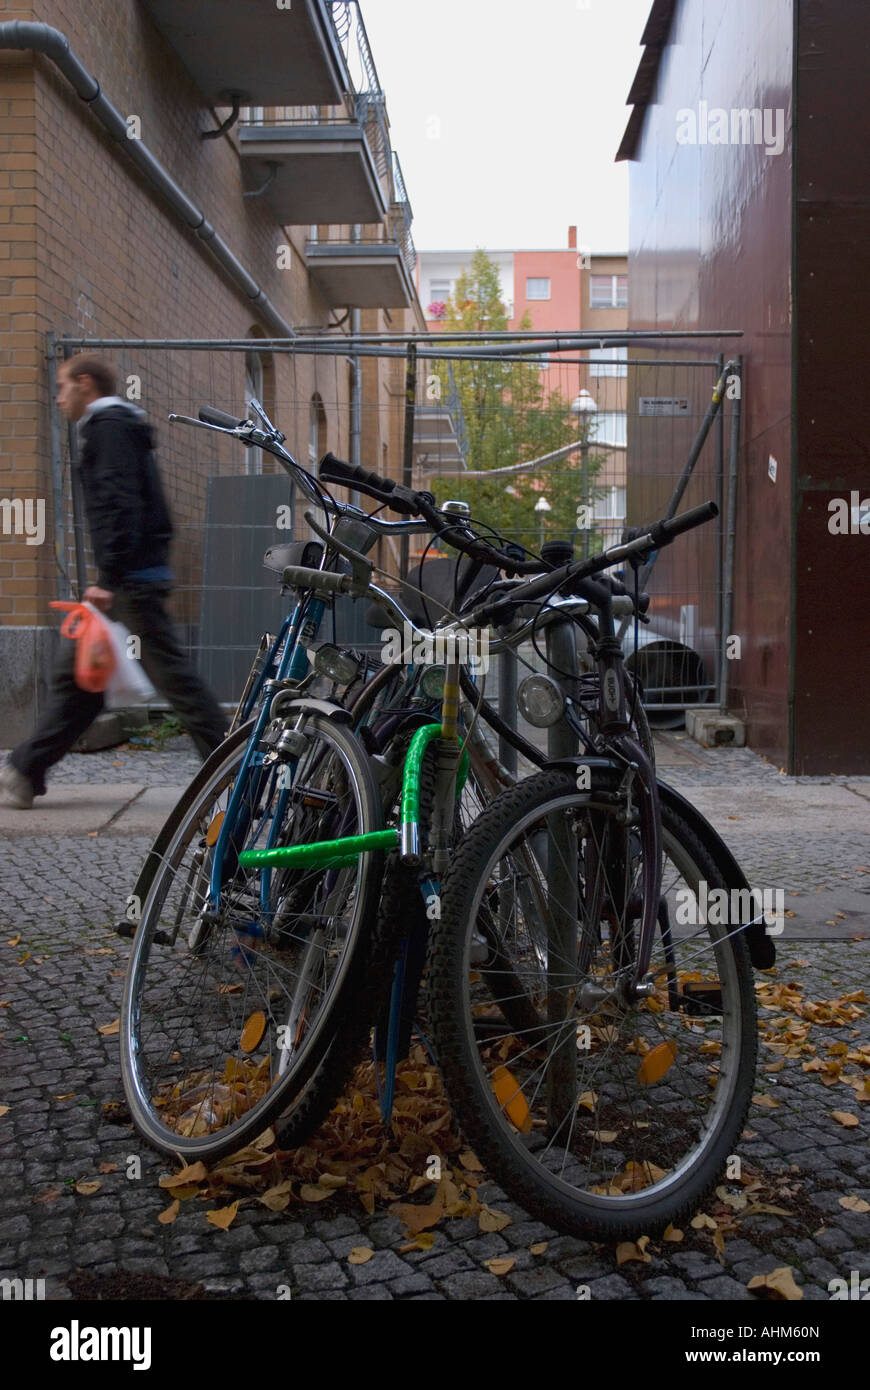 bicicletas,kreuzberg,berlin,alemania,germany.bikes - Stock Image